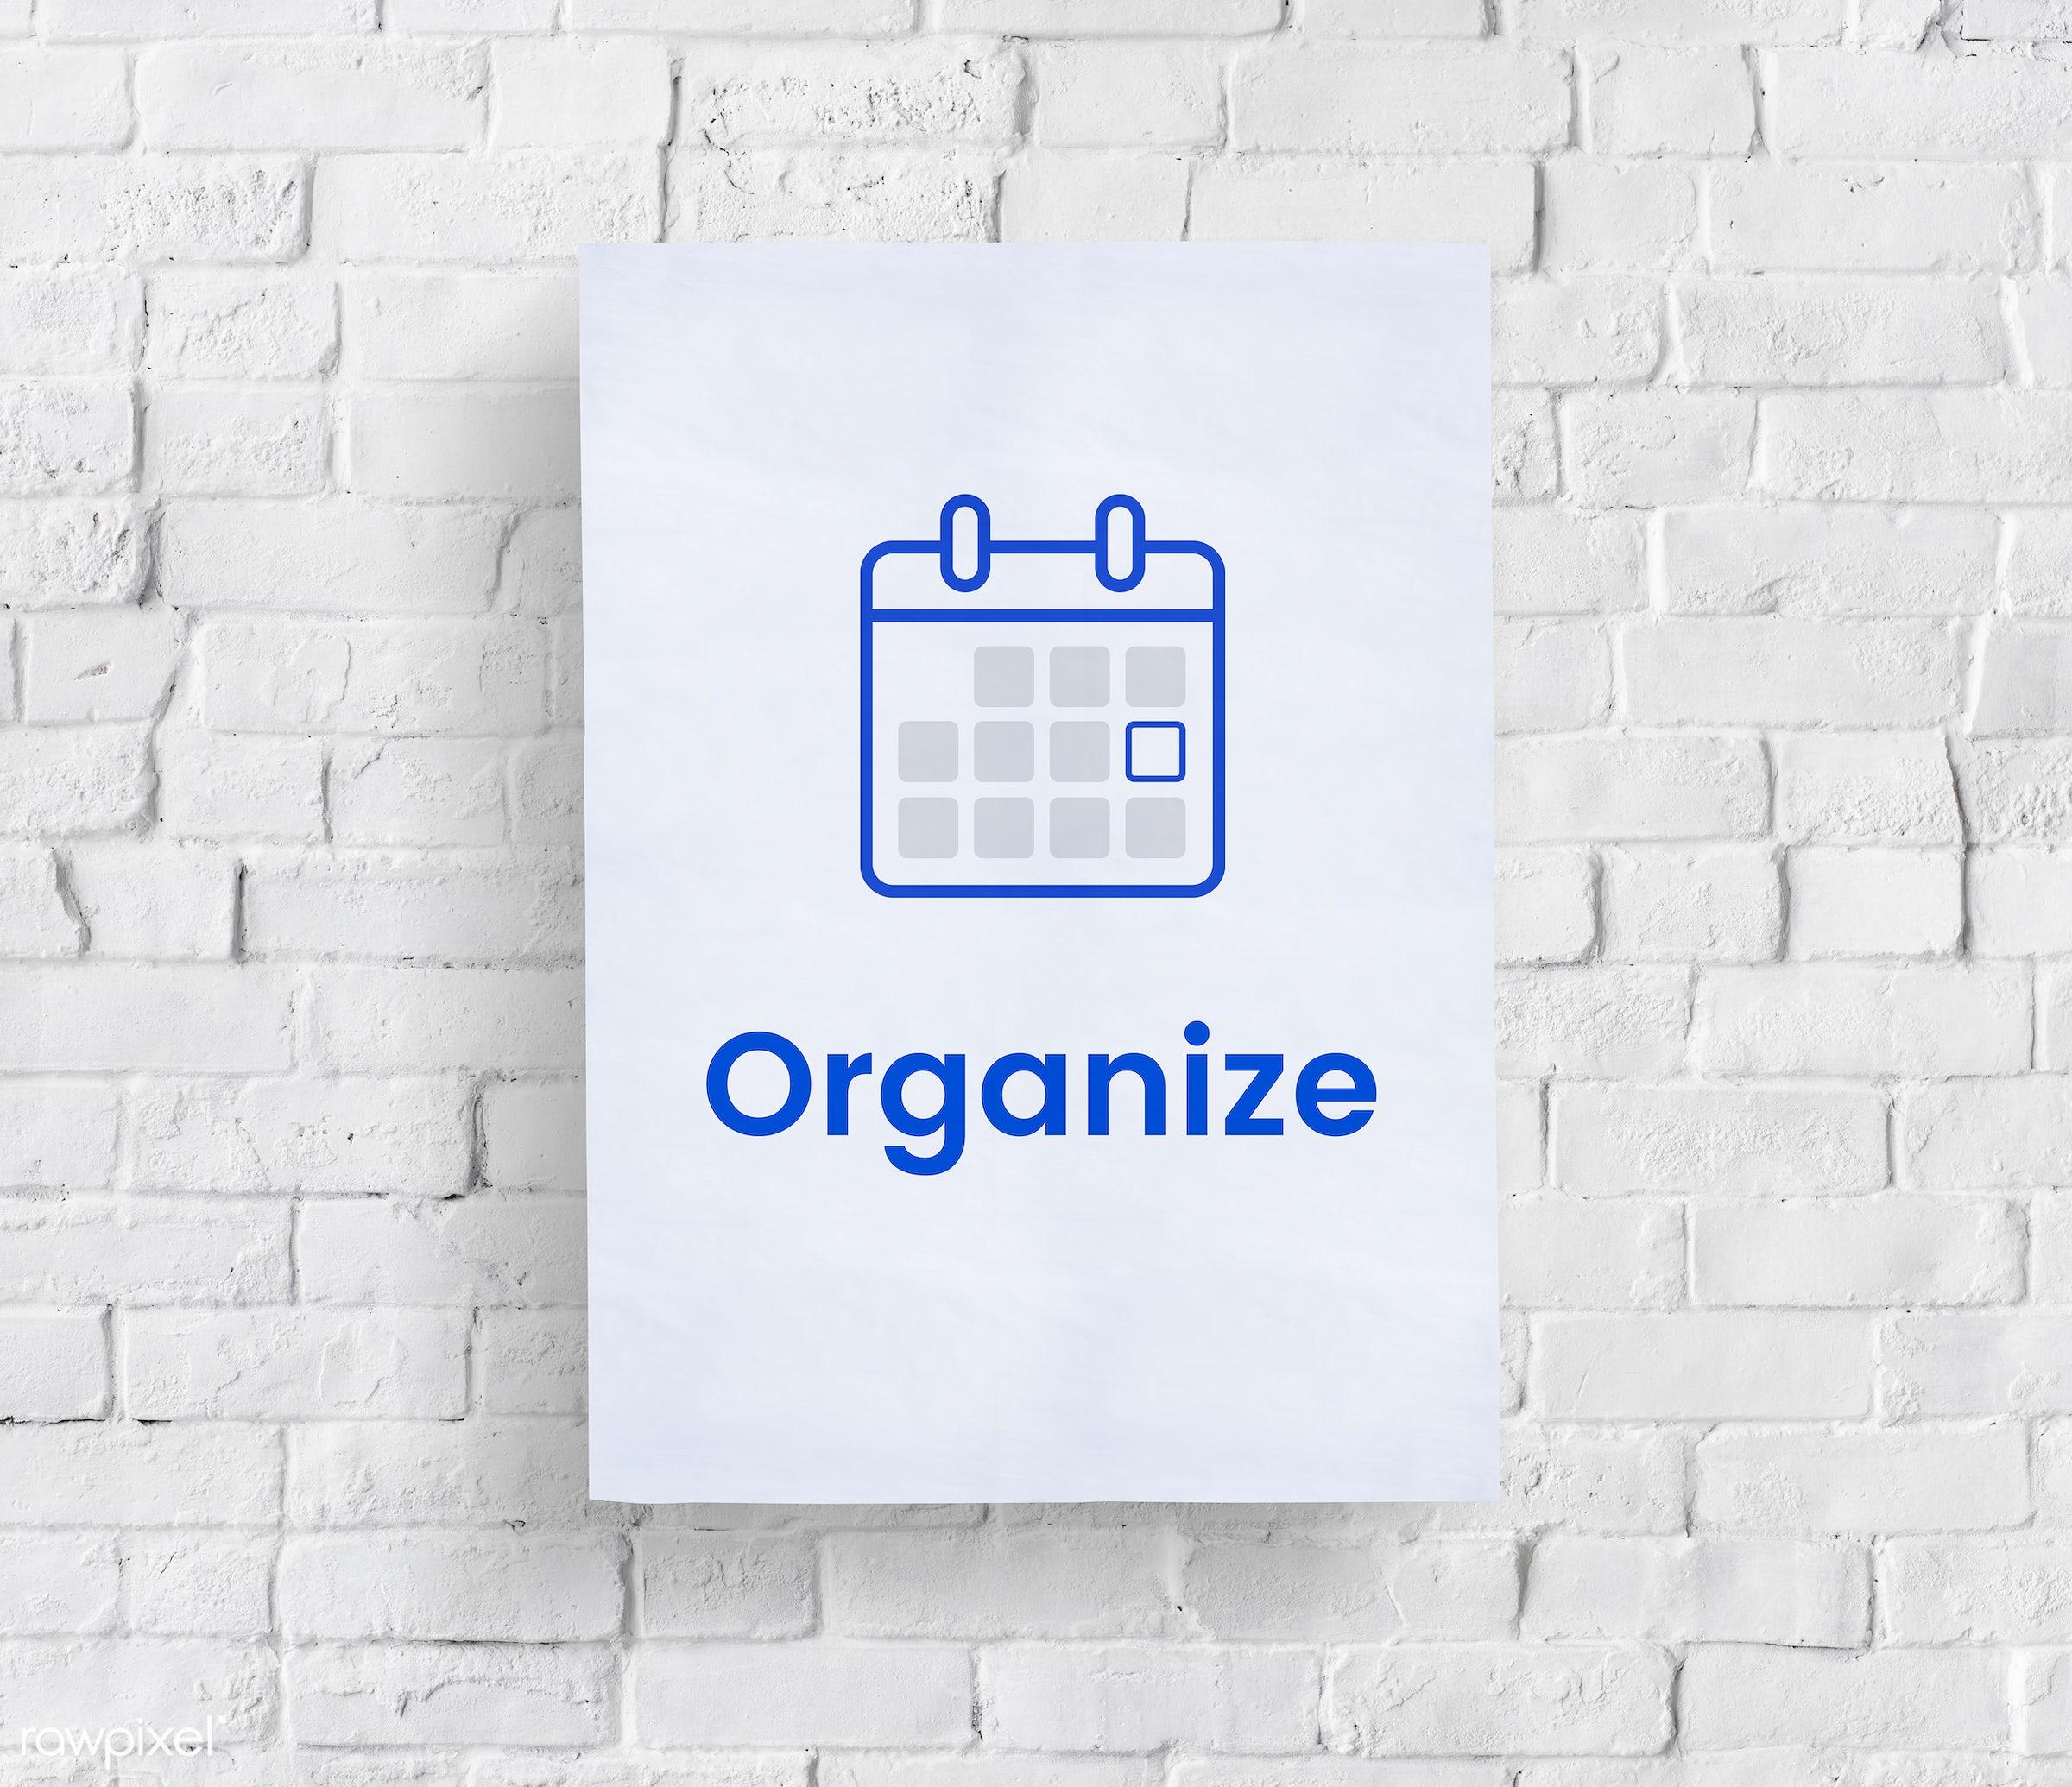 advertise, advertisement, agenda, alert, appointment, banner, bricks, brickwall, brickwork, calendar, concrete, events,...